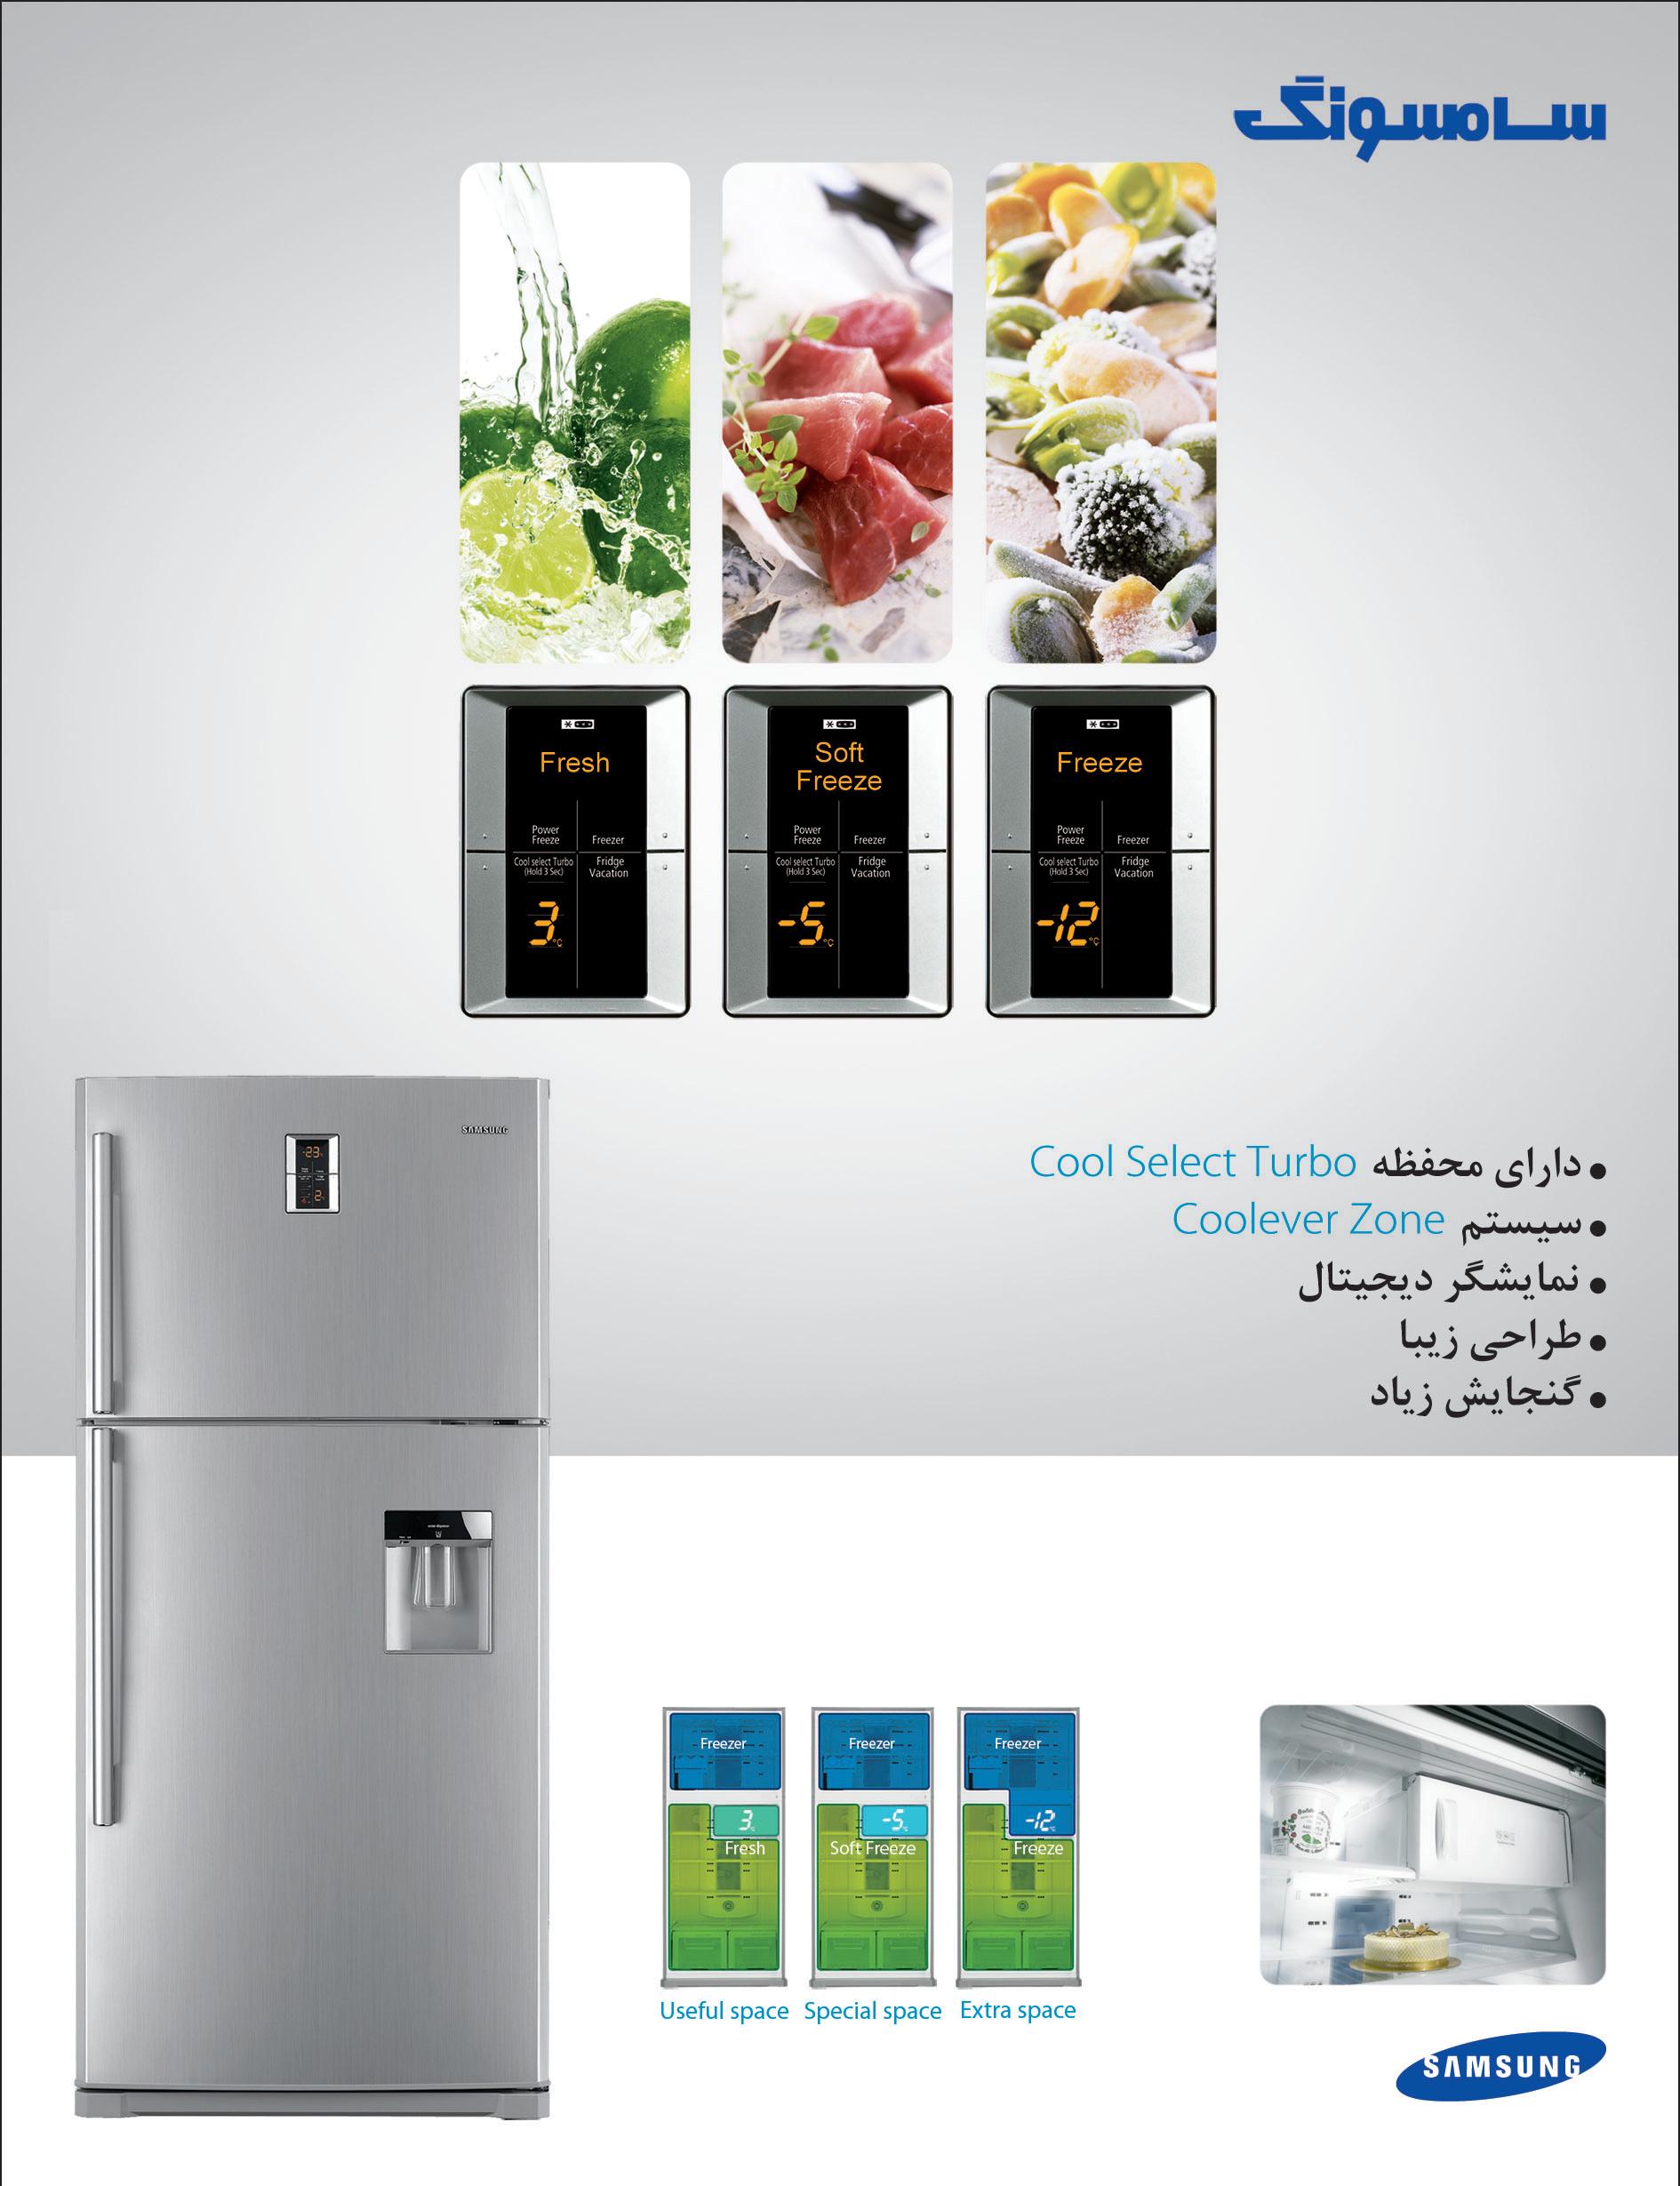 Refregerator Samsung(87.04.25)